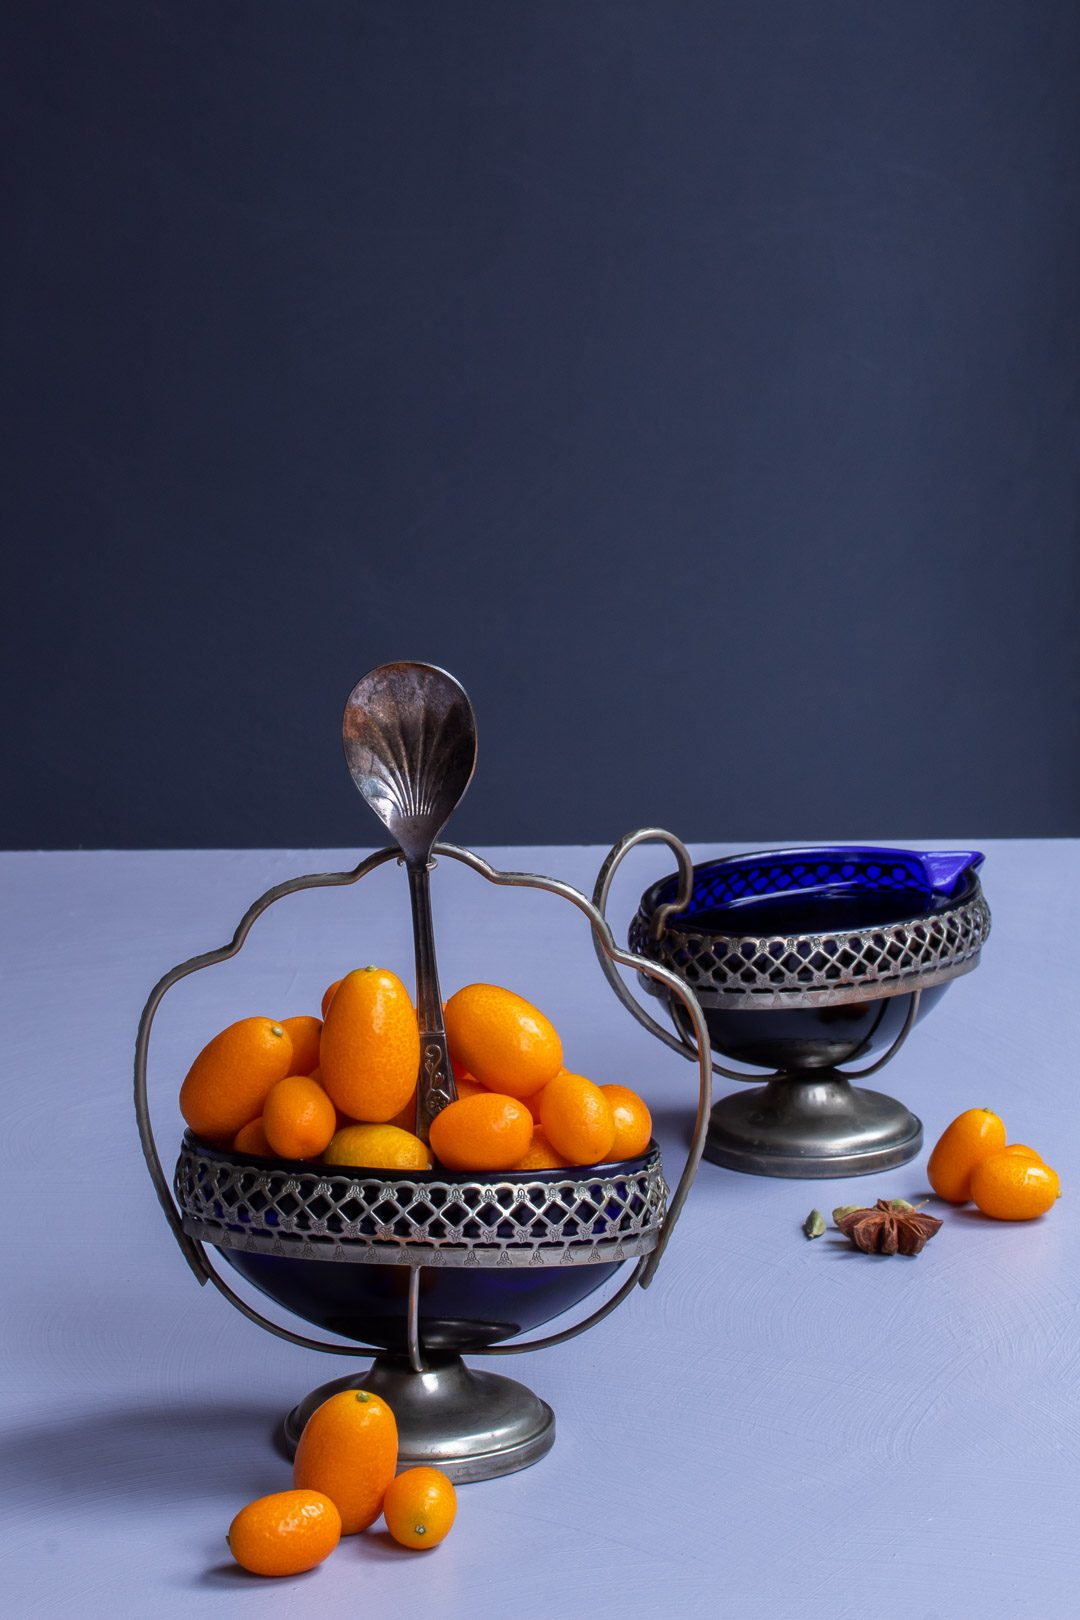 making cumquat brandy with blue glass bowl of cumquats and glass jug of brandy